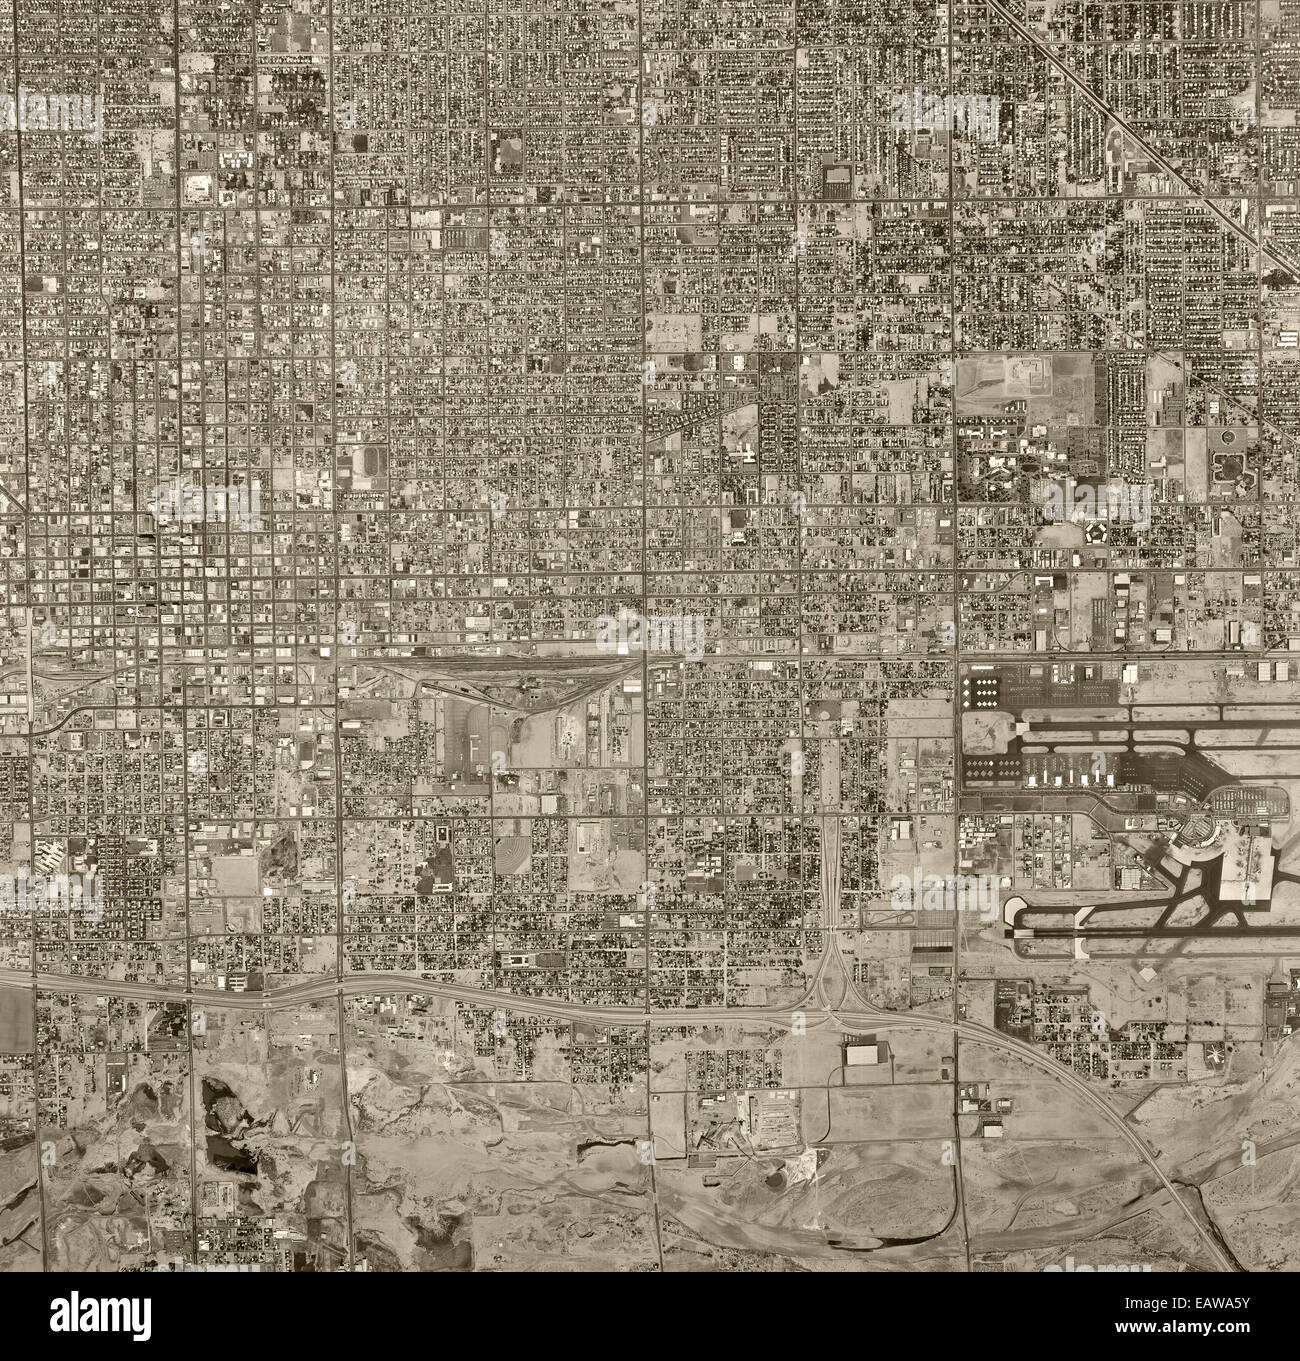 historical aerial photograph of Phoenix, Arizona, 1967 - Stock Image